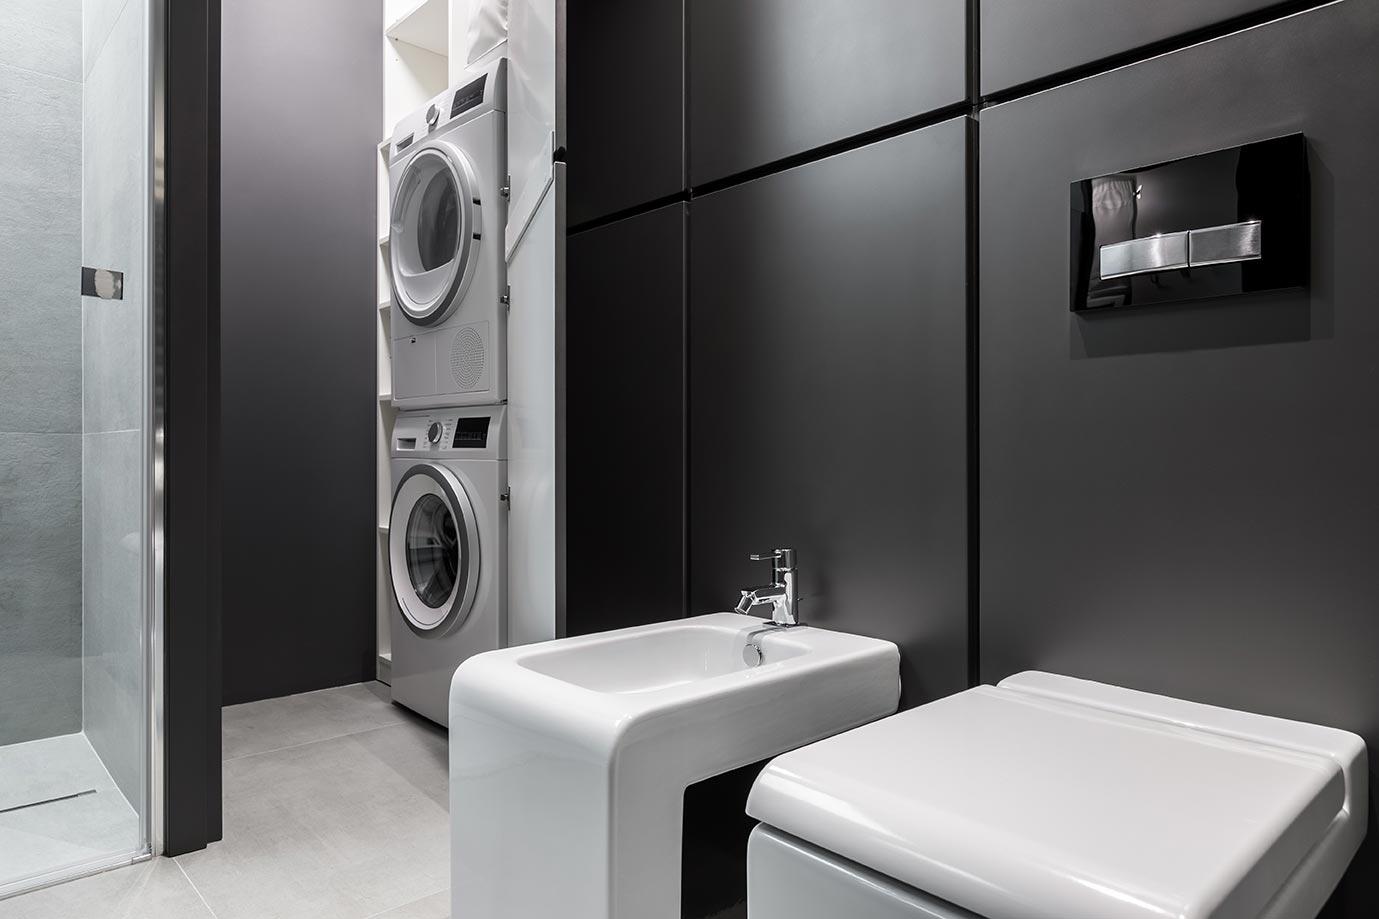 AJM-Plumbers_Melbourne_Australia_laundry-plumbing-services